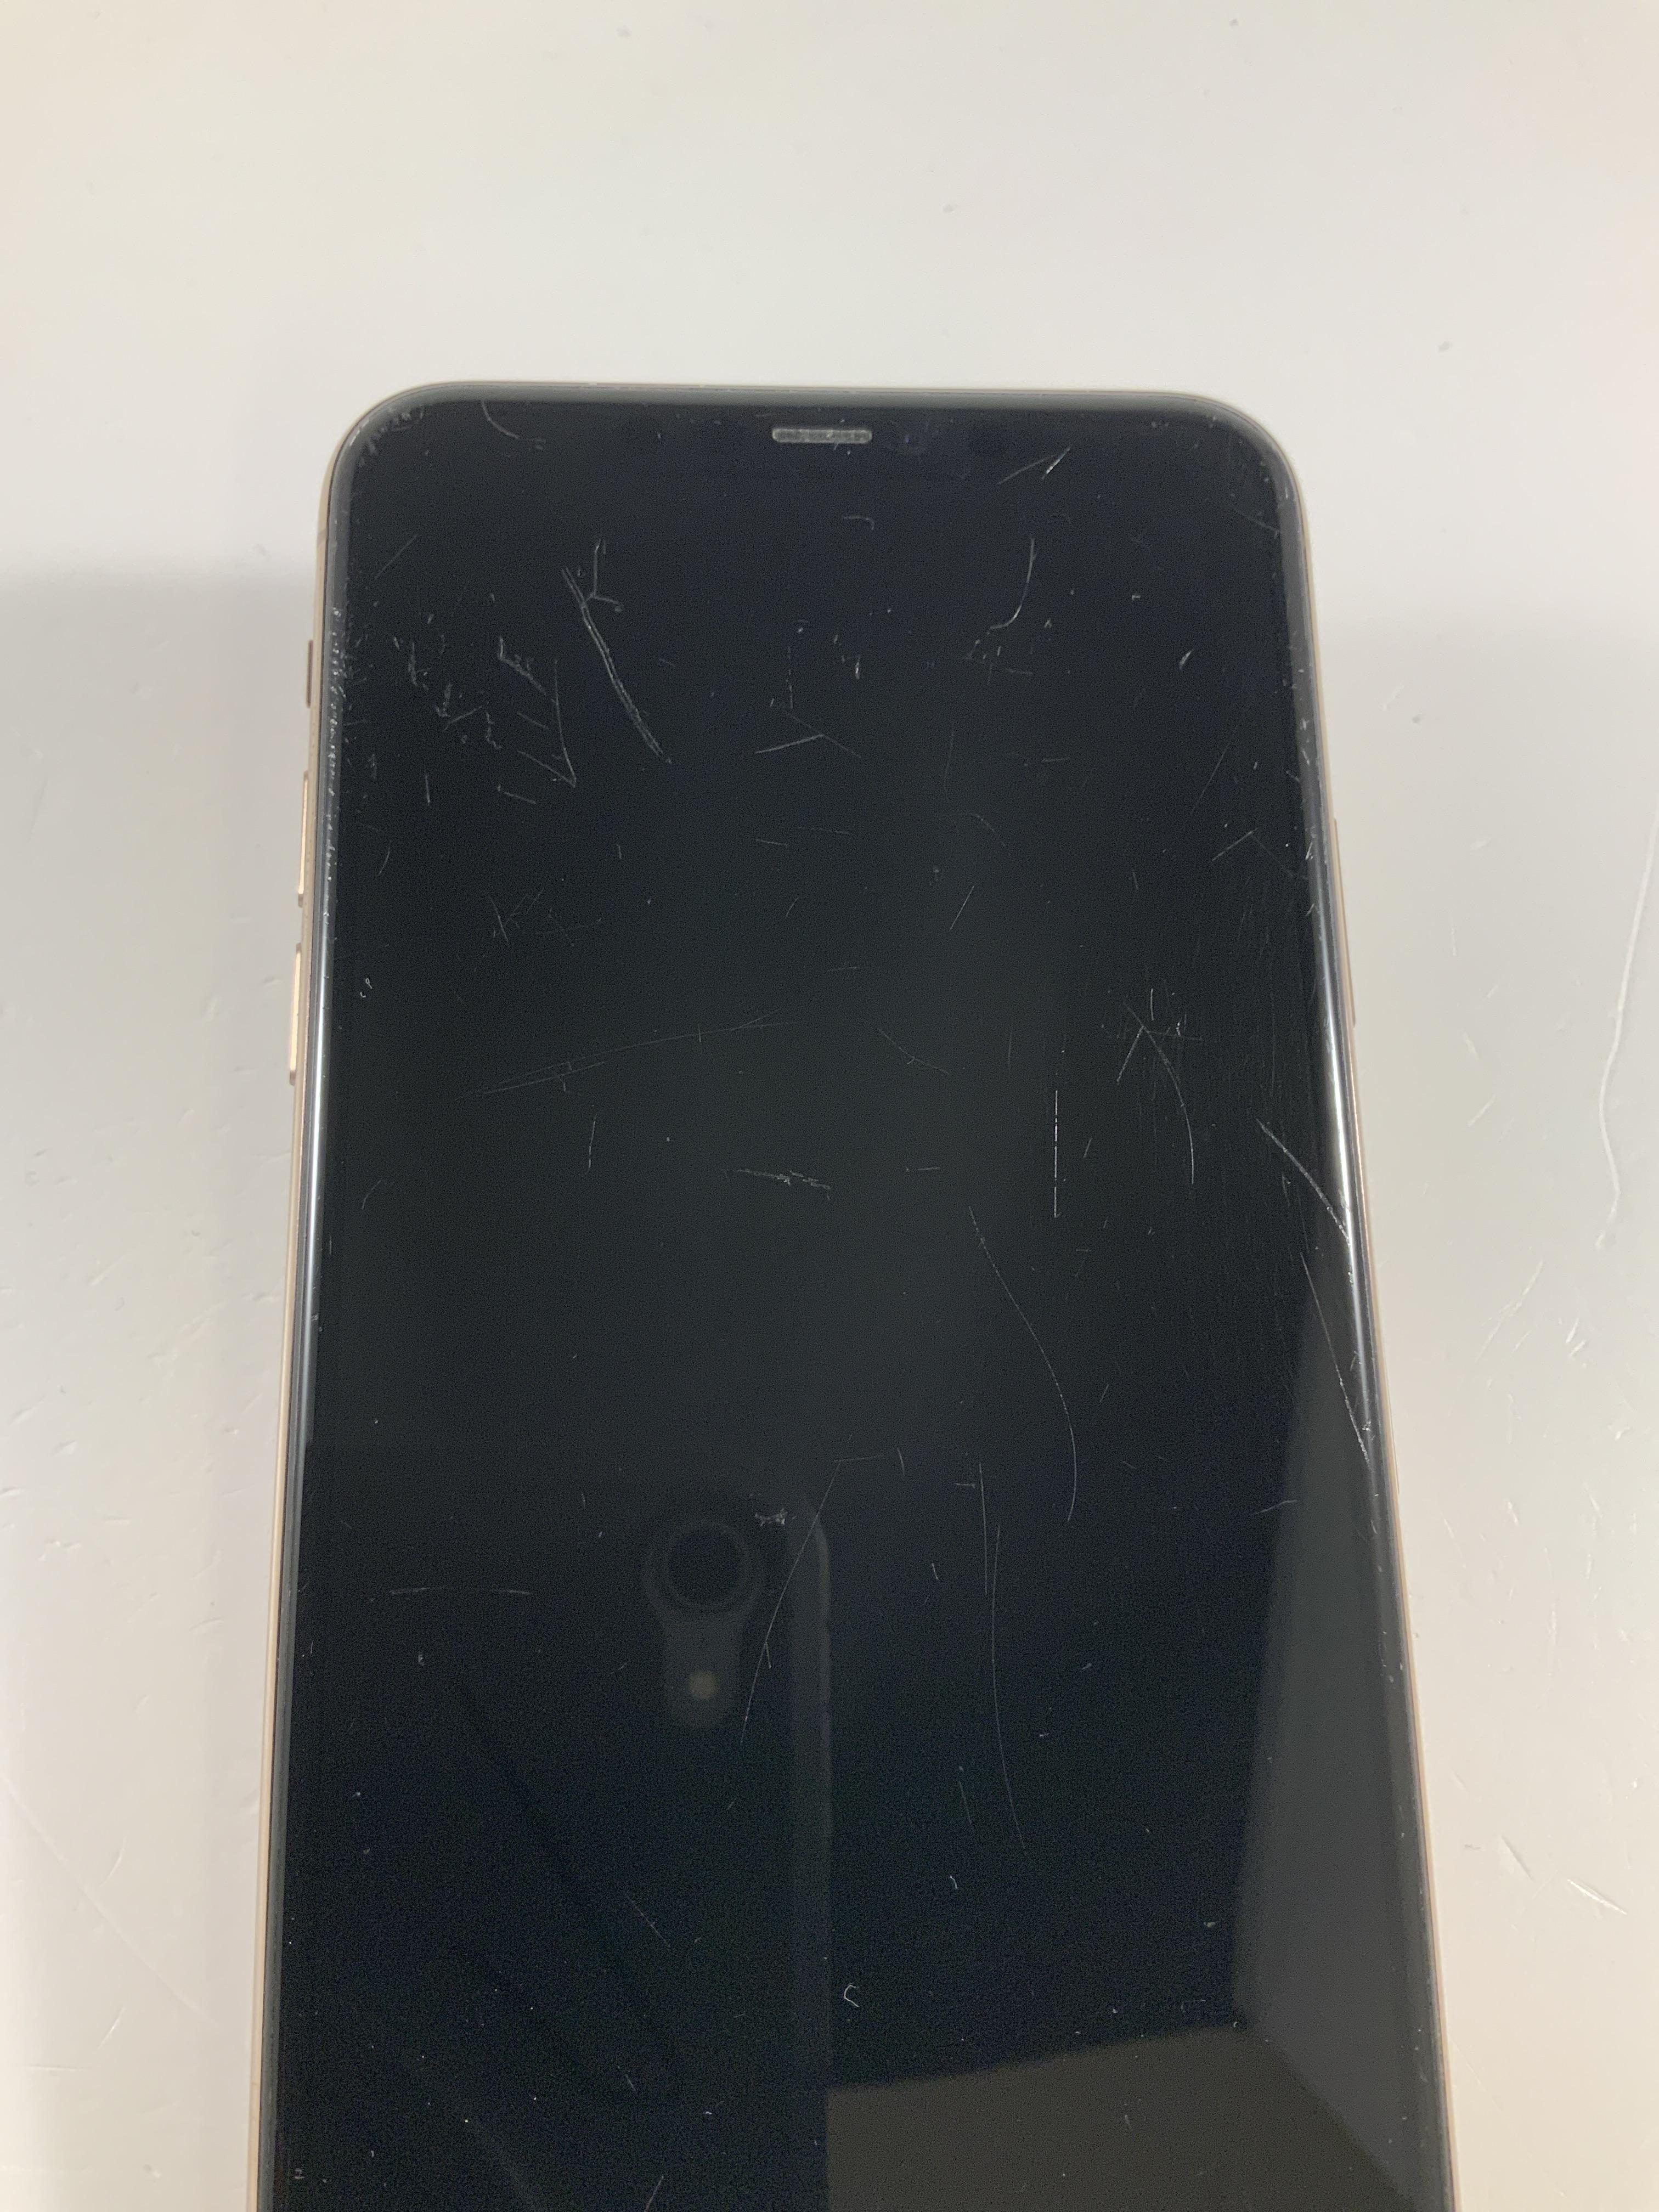 iPhone 11 Pro Max 256GB, 256GB, Gold, Bild 3